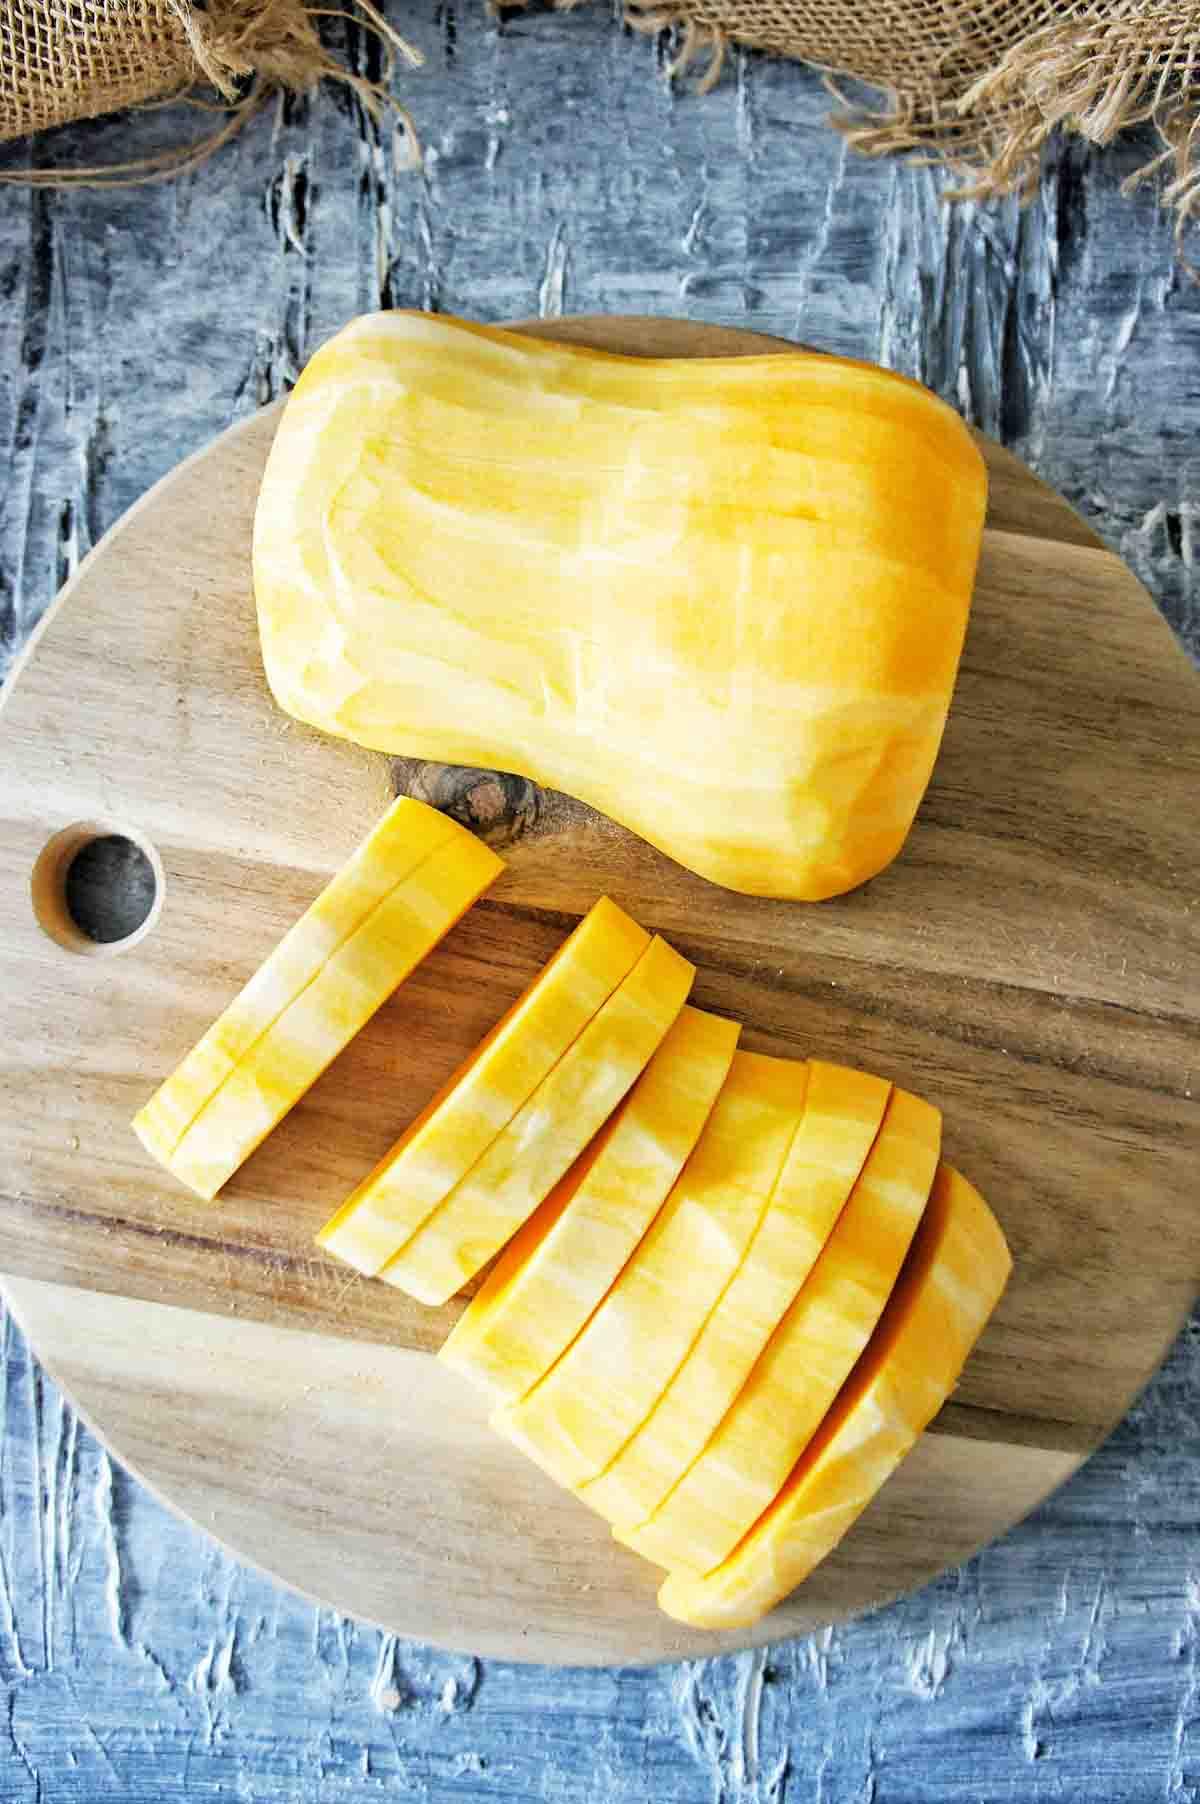 Pumpkin being prepared sliced for frittata